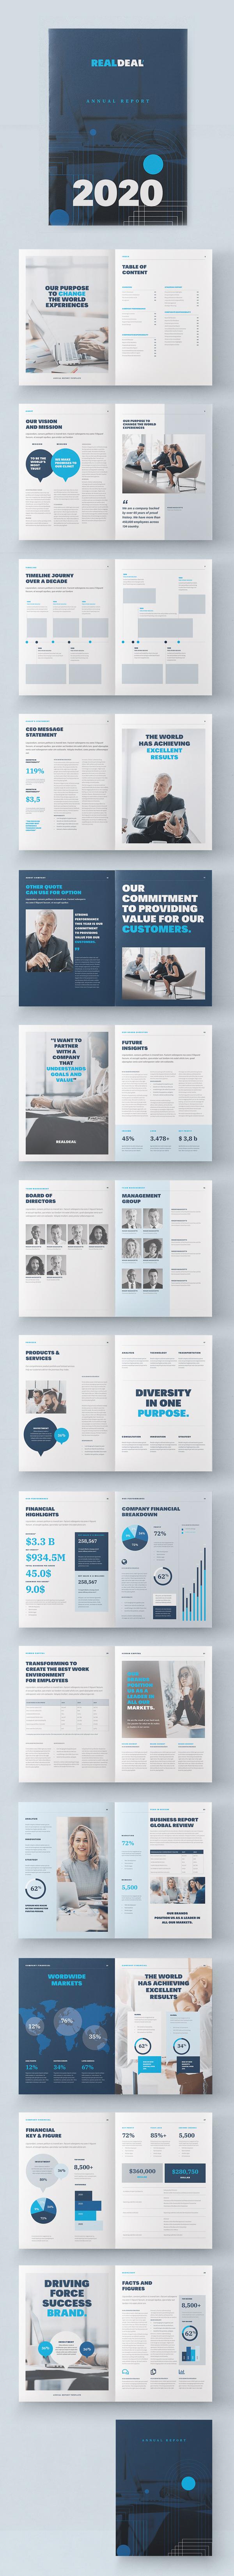 Corporate Blue Annual Report Template